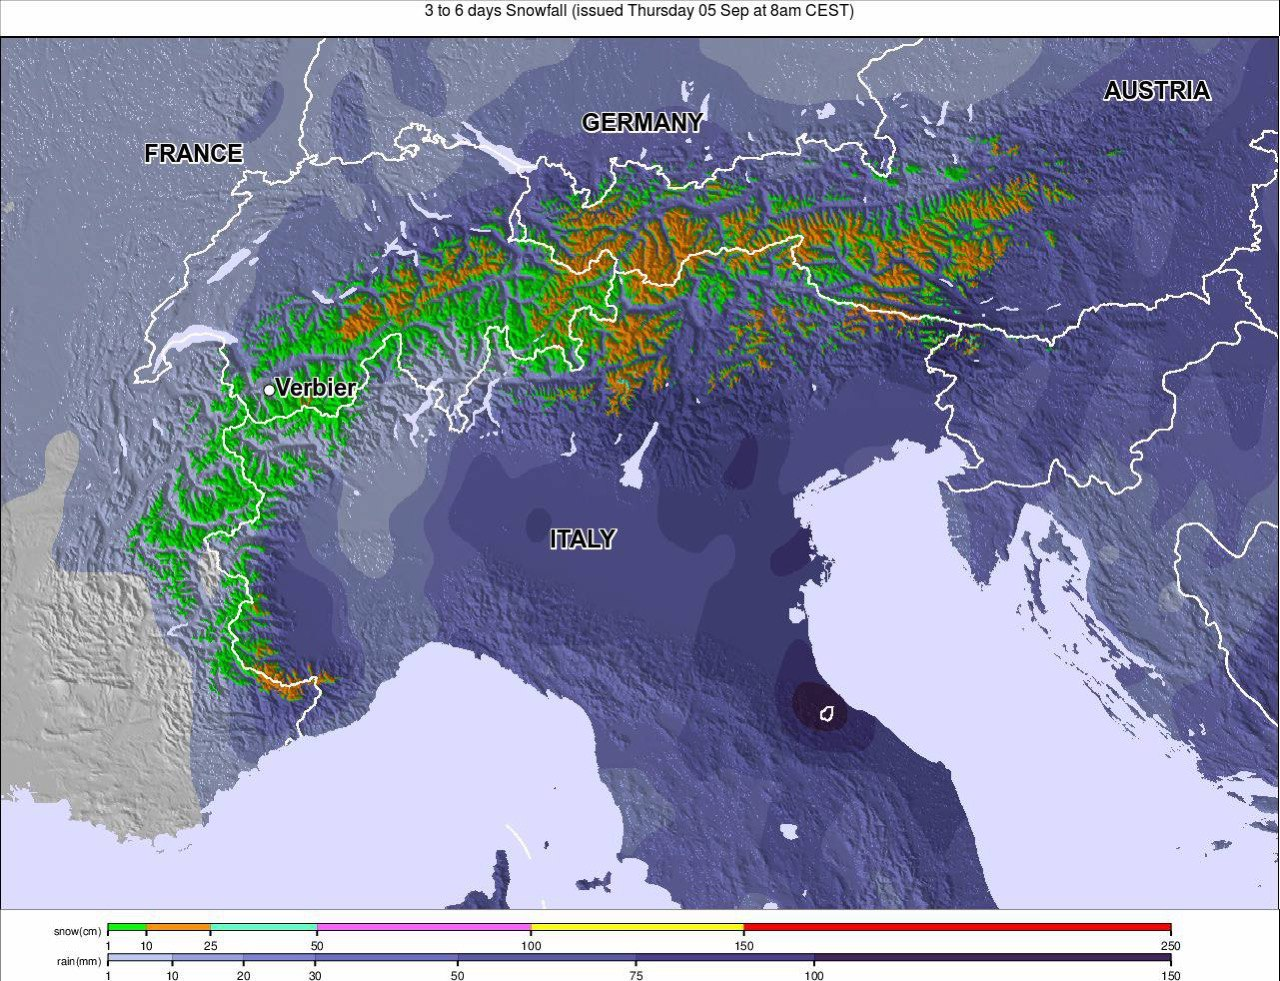 Heavy September Snow Forecast for Alpine Glaciers - The ...